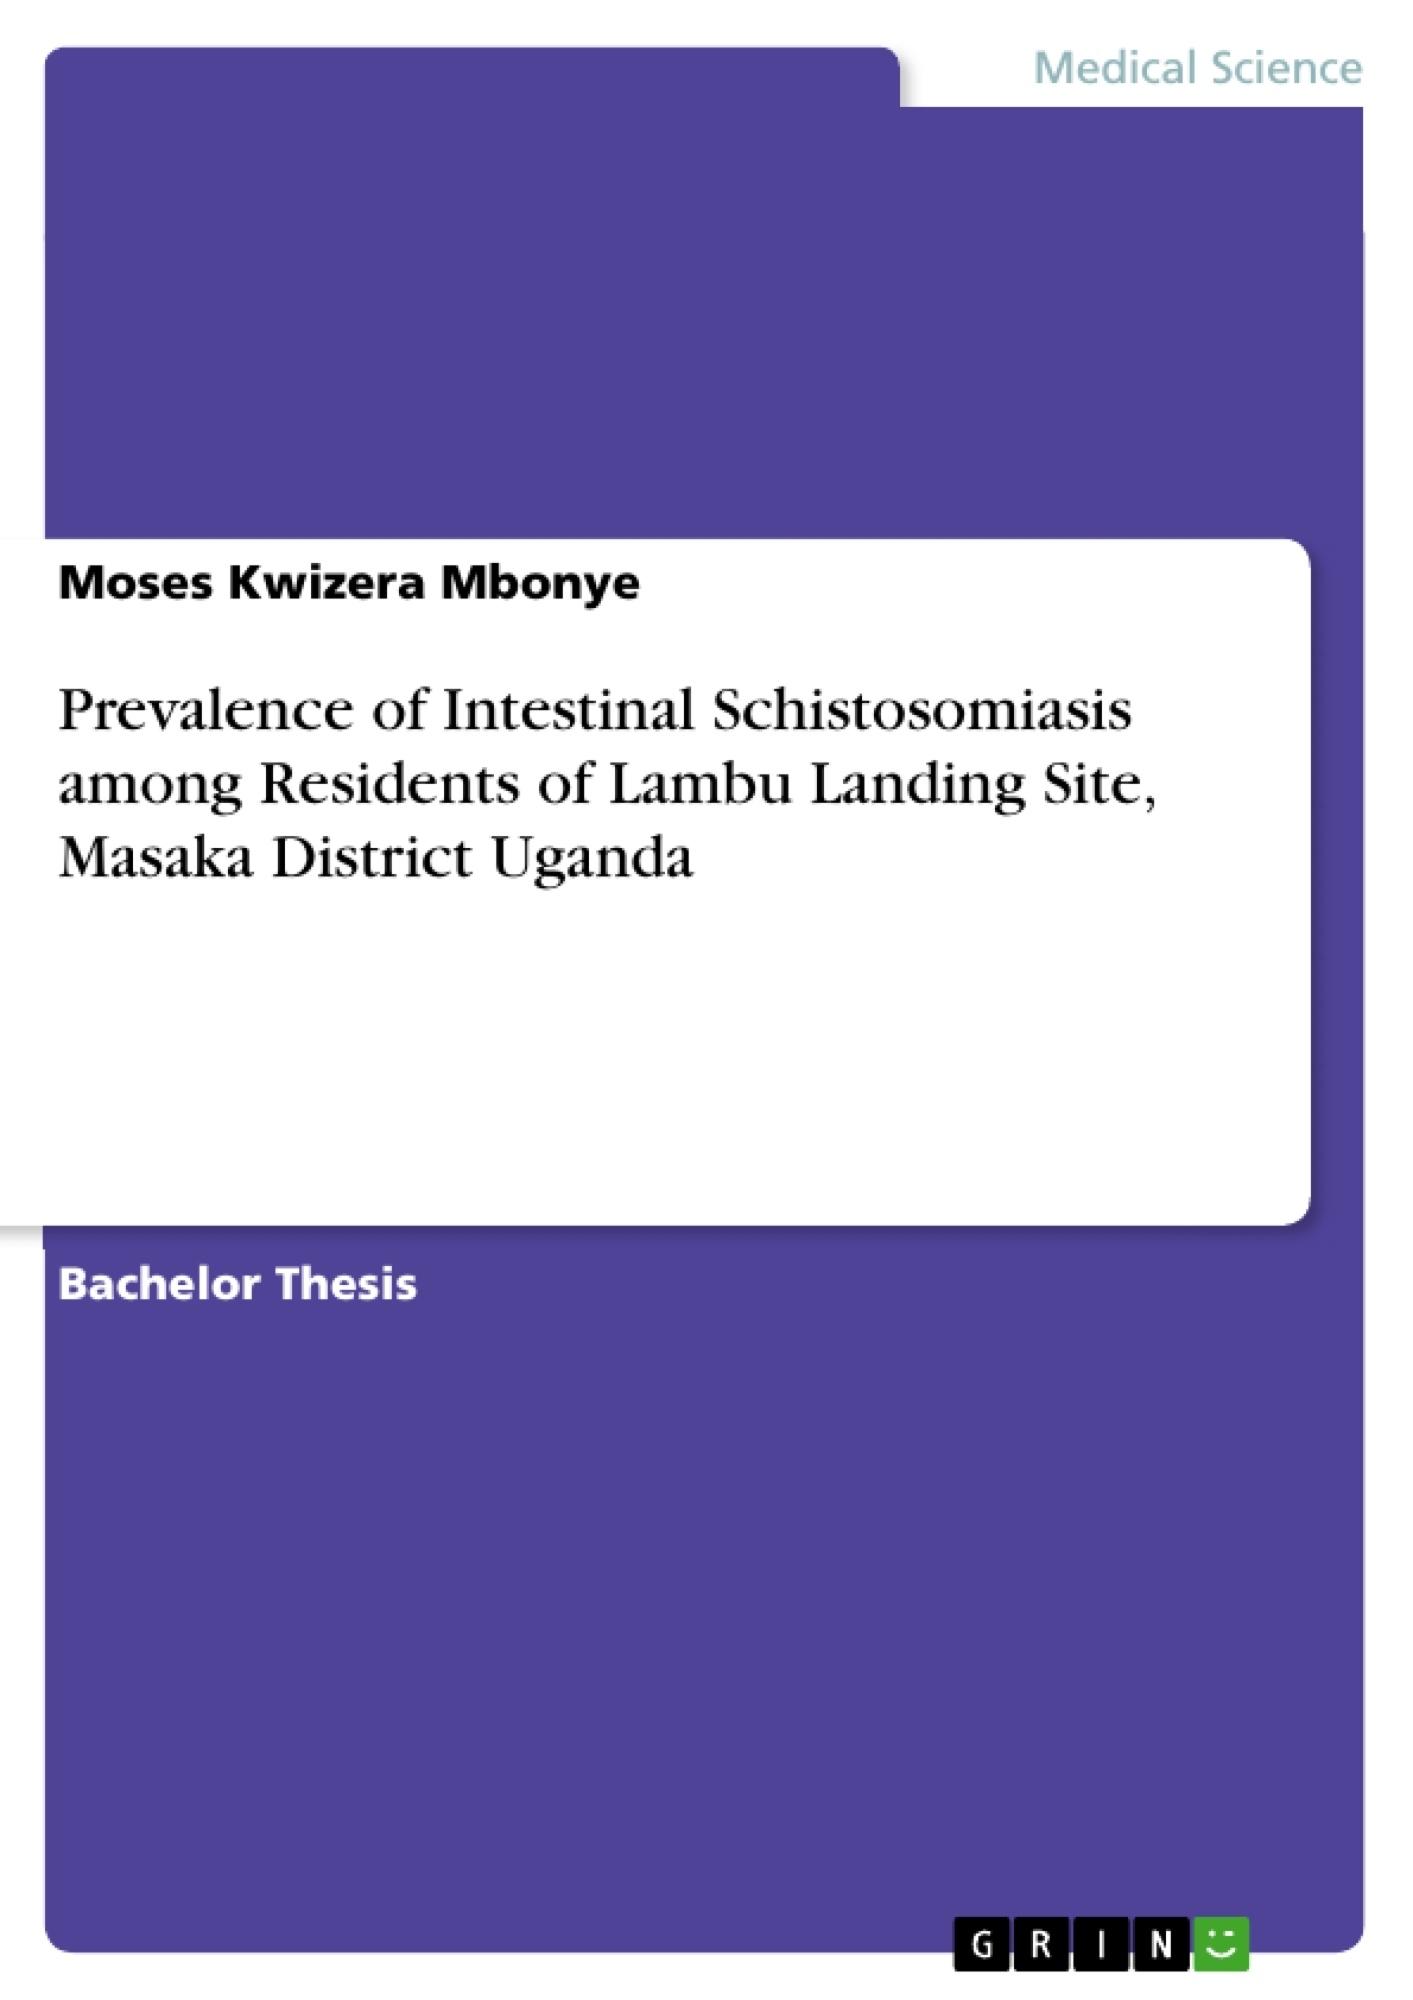 Title: Prevalence of Intestinal Schistosomiasis among Residents of Lambu Landing Site, Masaka District Uganda